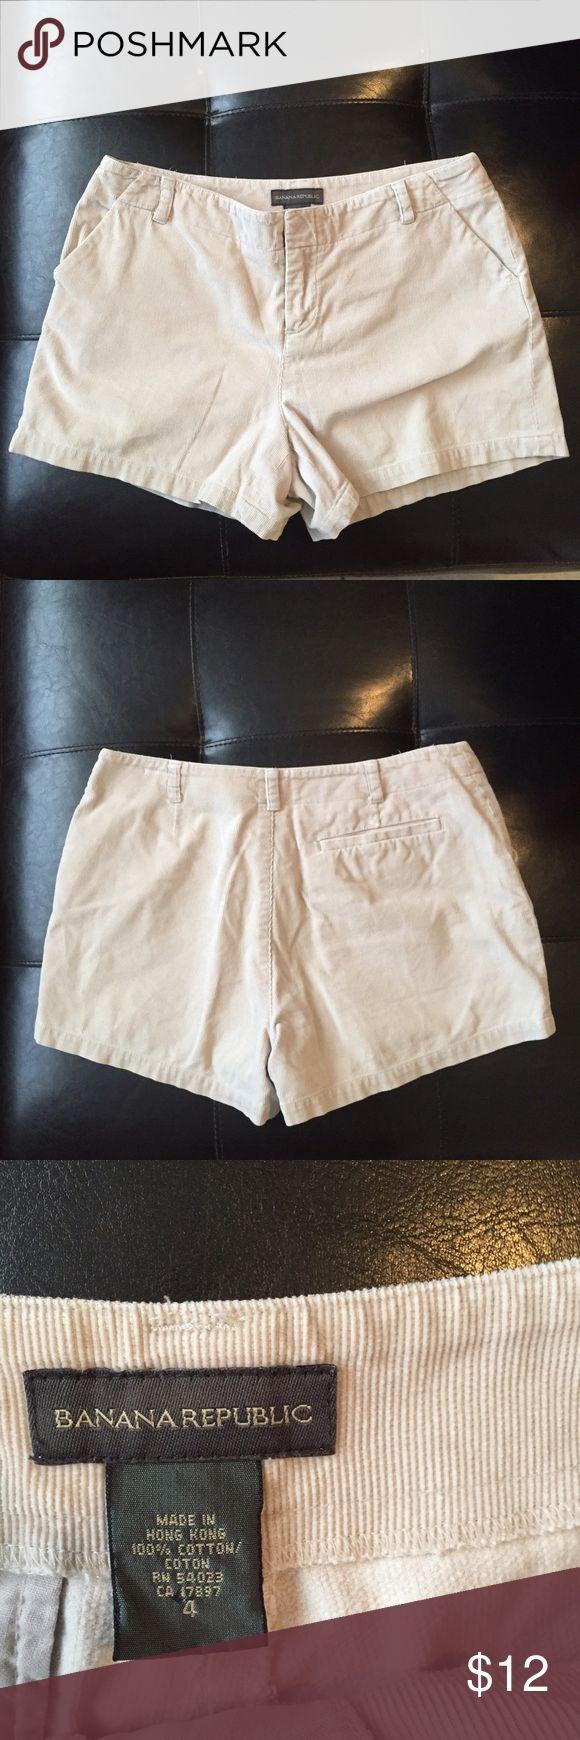 Banana republic corduroy shorts Banana republic corduroy shorts Banana Republic Shorts